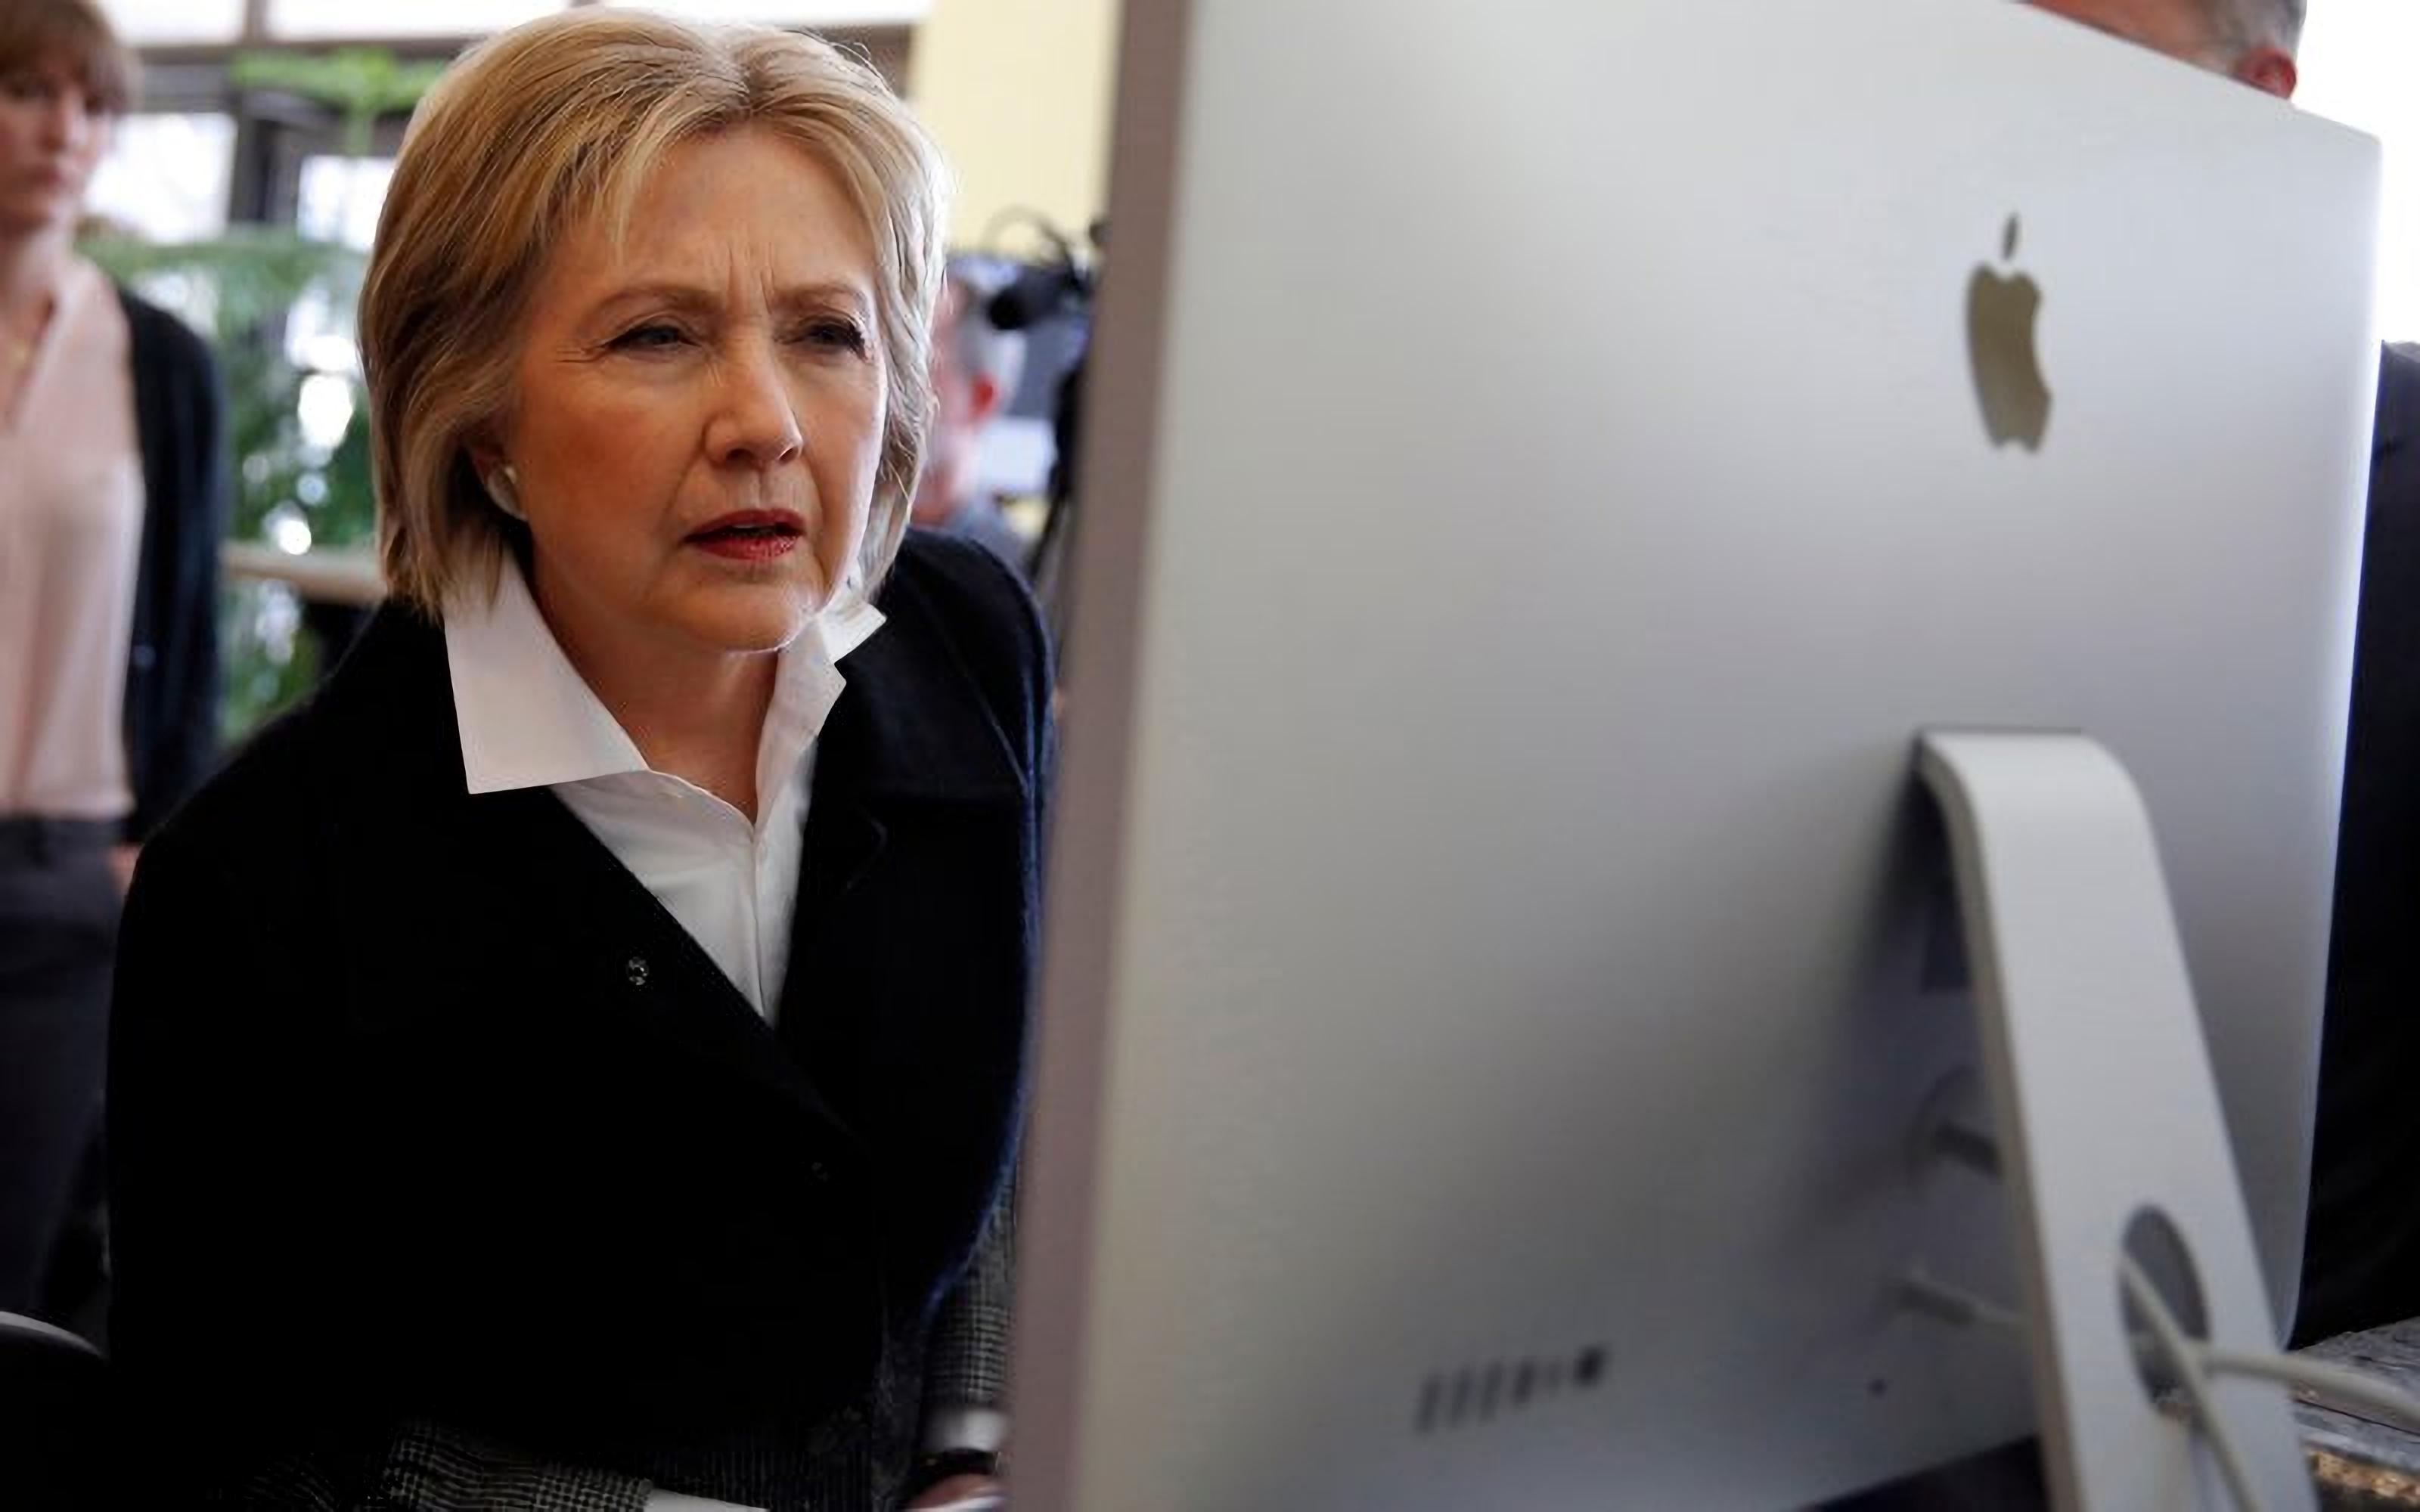 hillary clinton using a computer.jpg